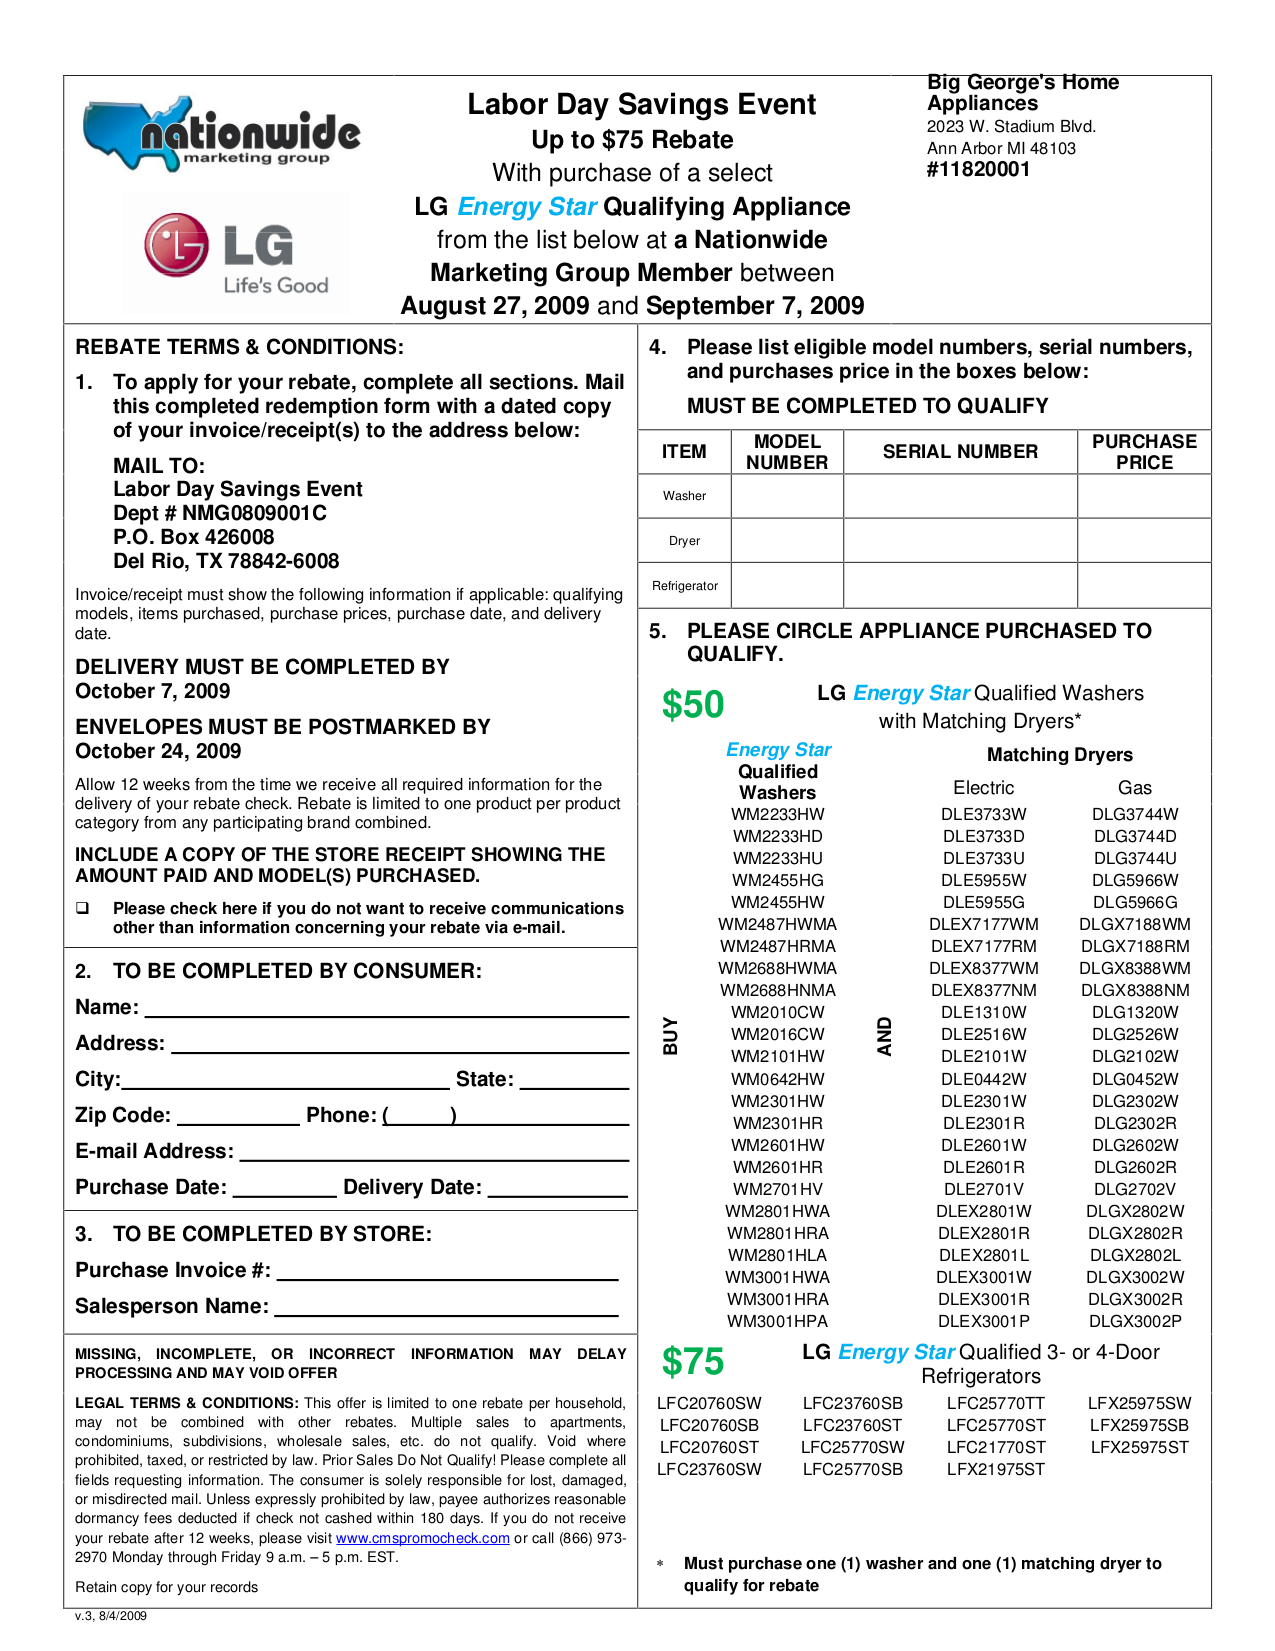 pdf for LG Refrigerator LFC25770TT manual